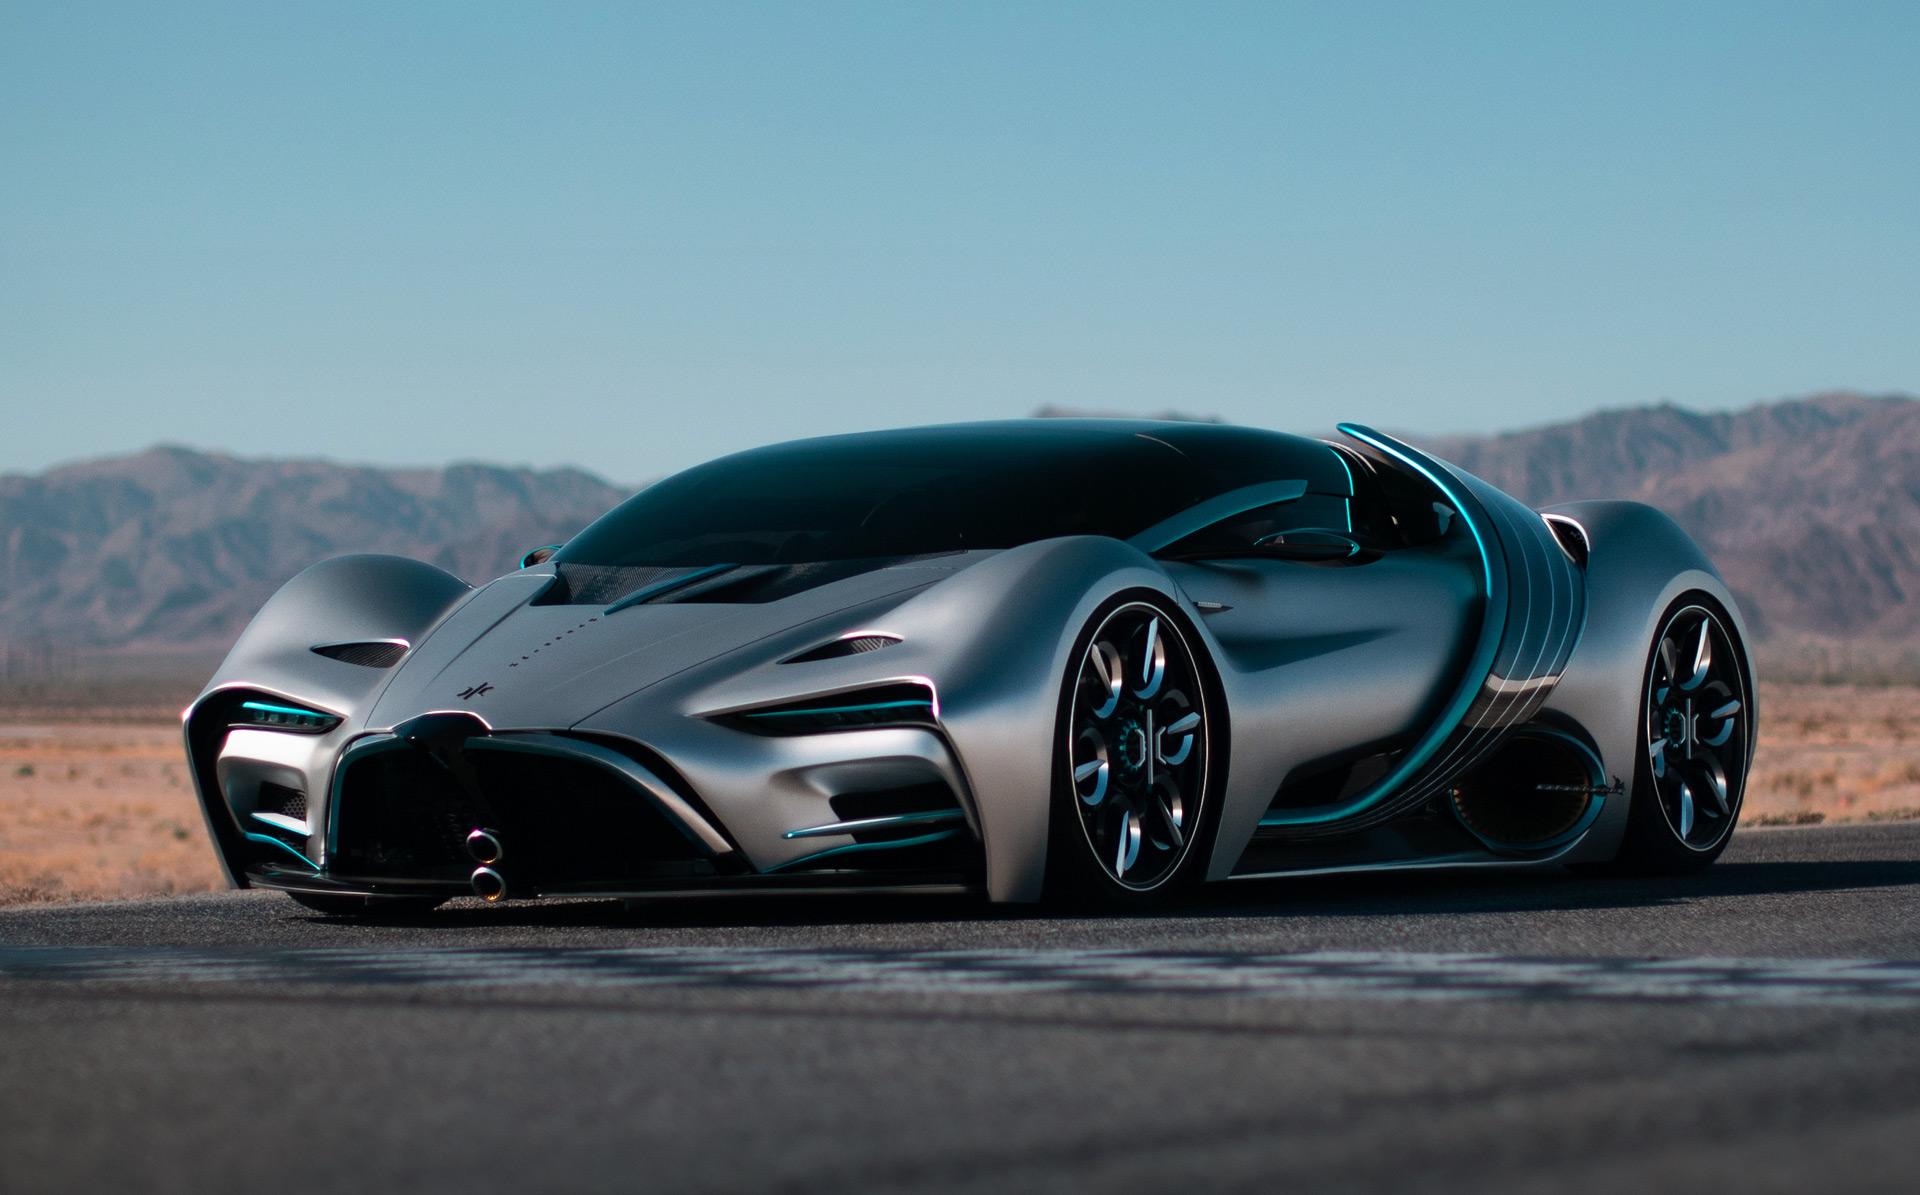 California firm Hyperion unveils XP-1 hydrogen supercar